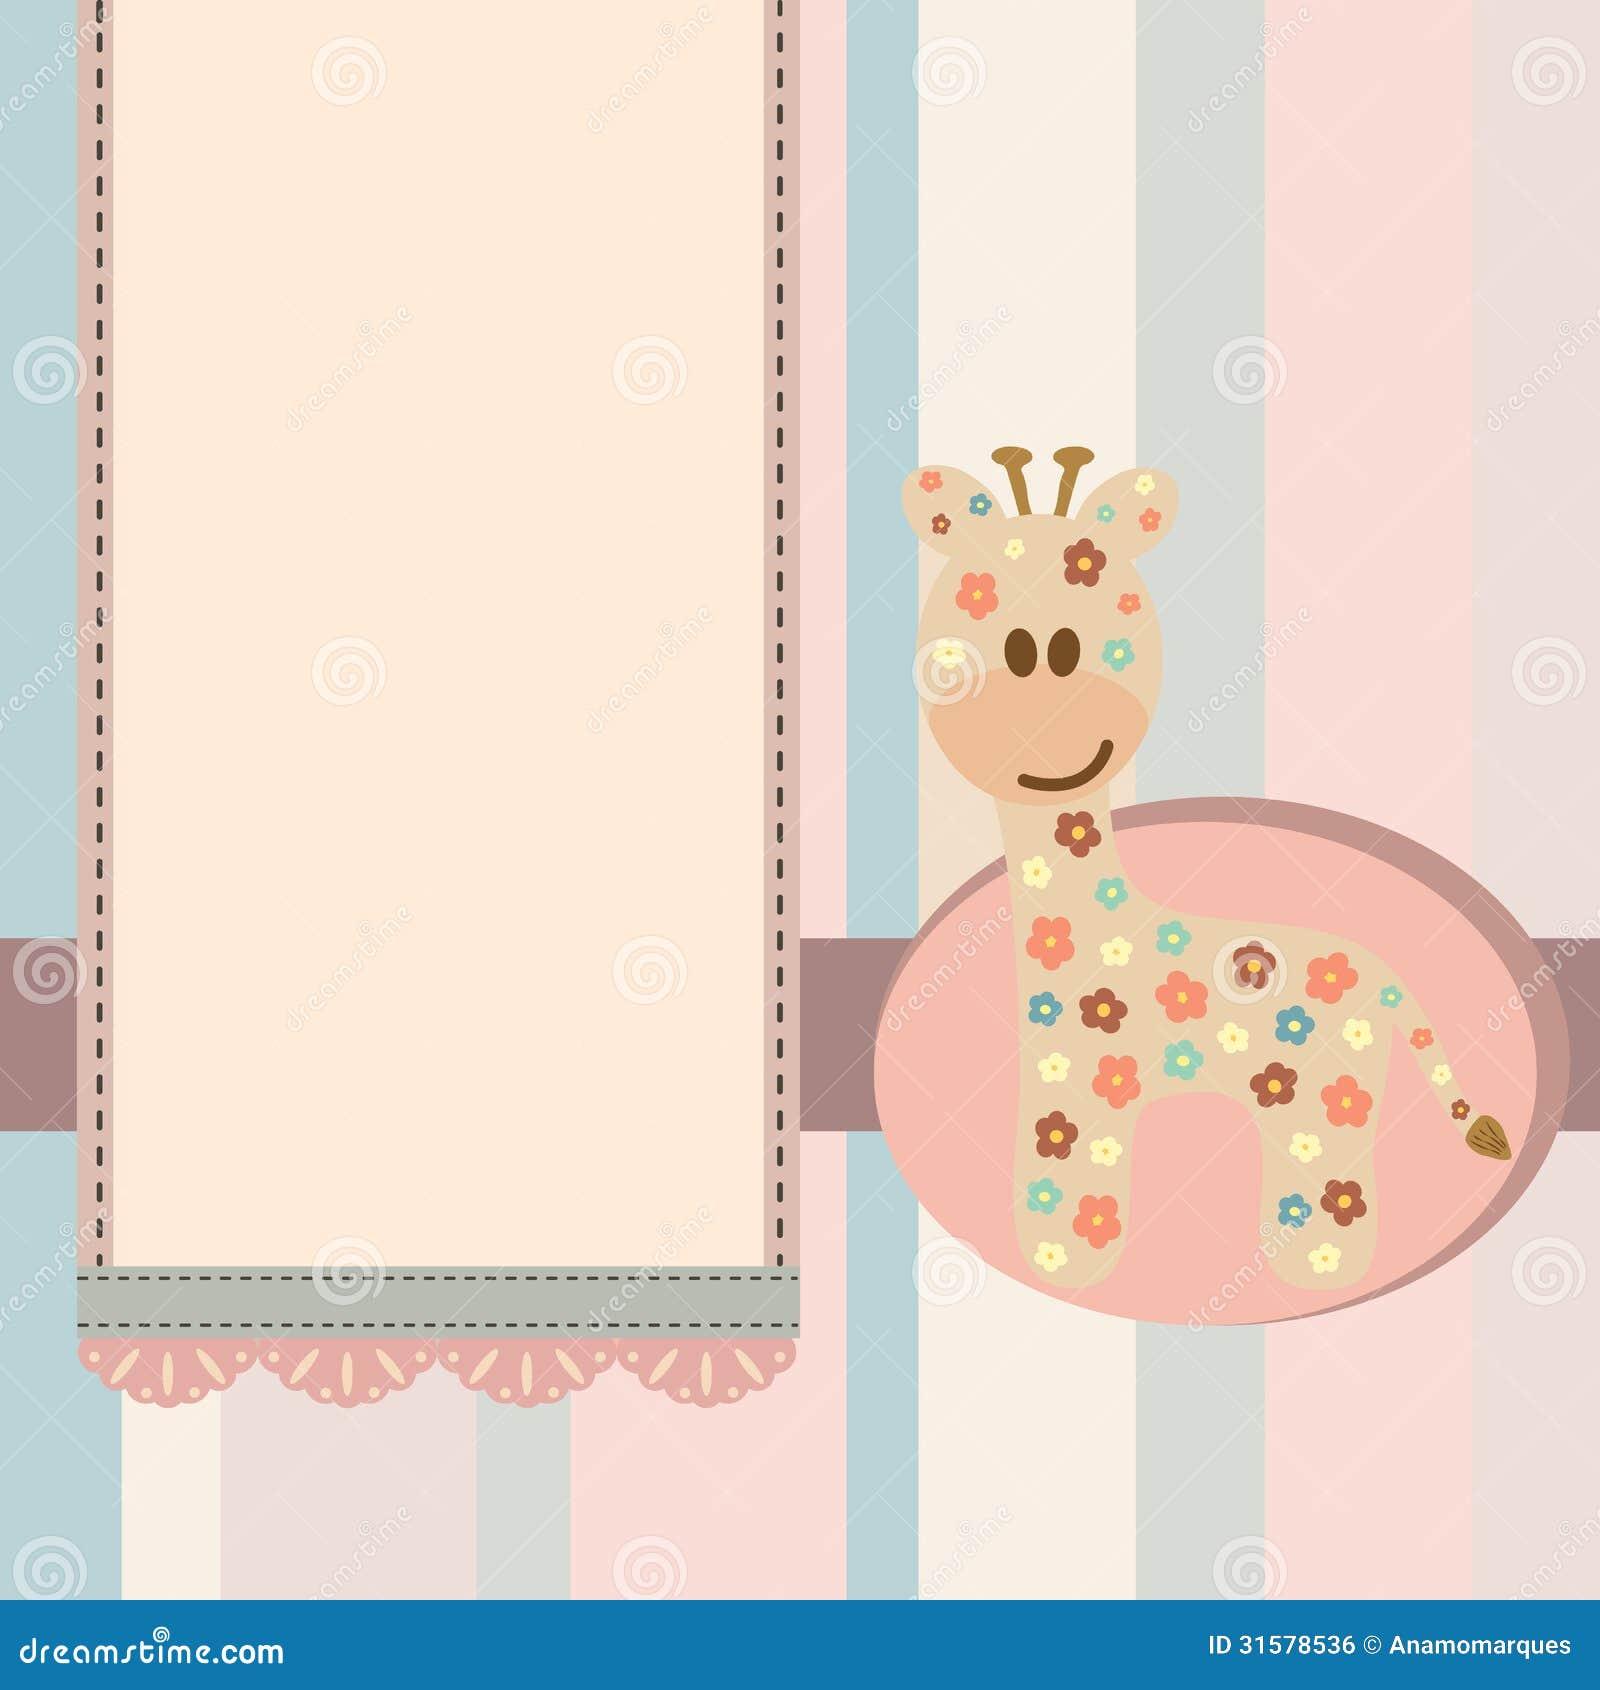 Baby Giraffe Label Royalty Free Stock Image - Image: 31578536